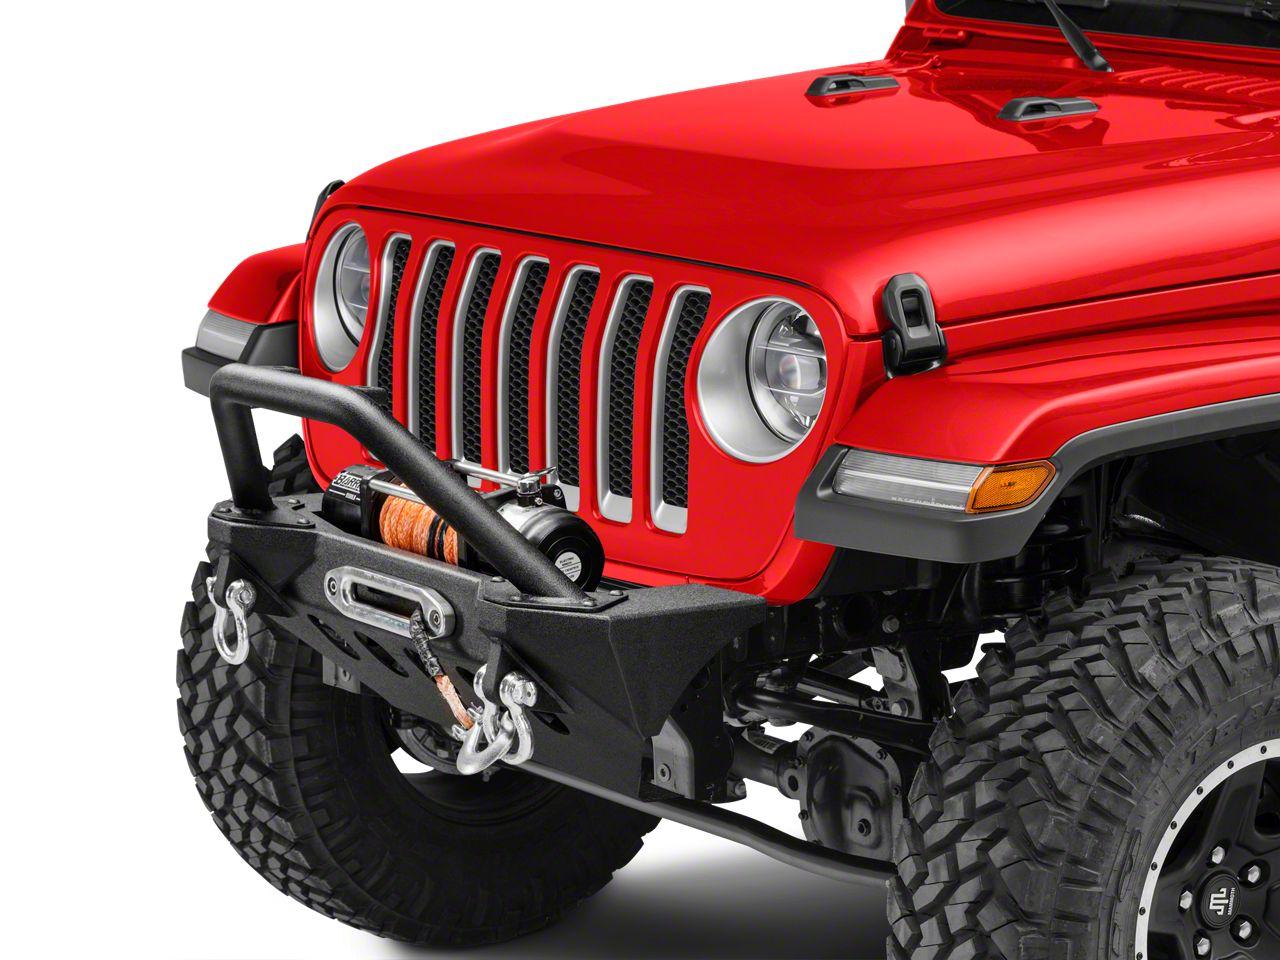 RedRock 4x4 Stubby Front Bumper (2018 Jeep Wrangler JL)